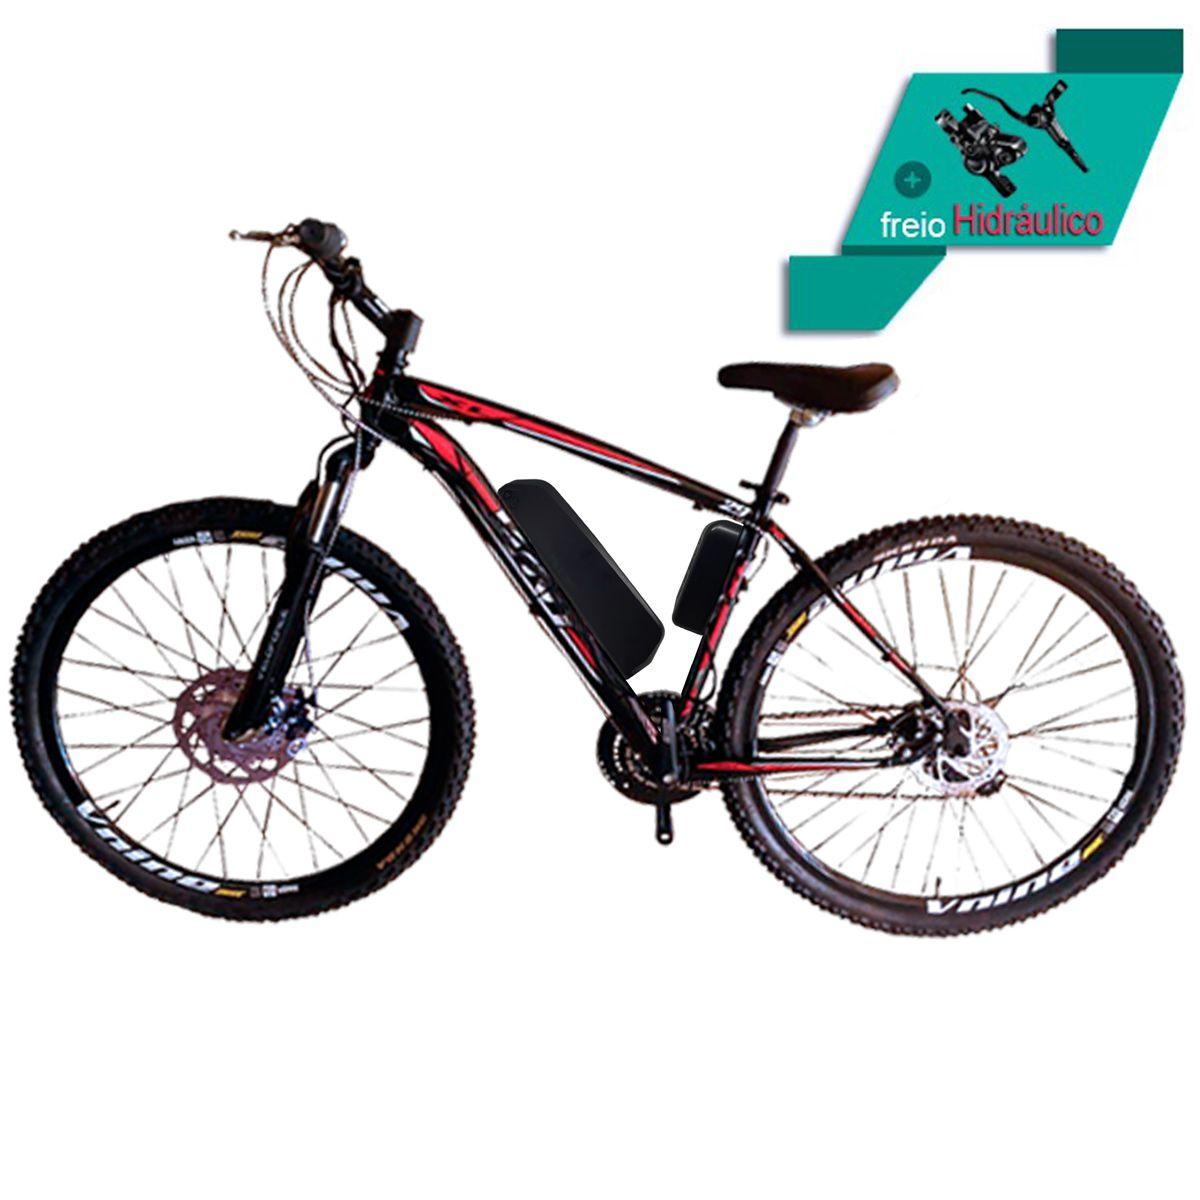 Bicicleta Elétrica Aro 29 Alumínio Bateria de Litio TecUltra 500 watts